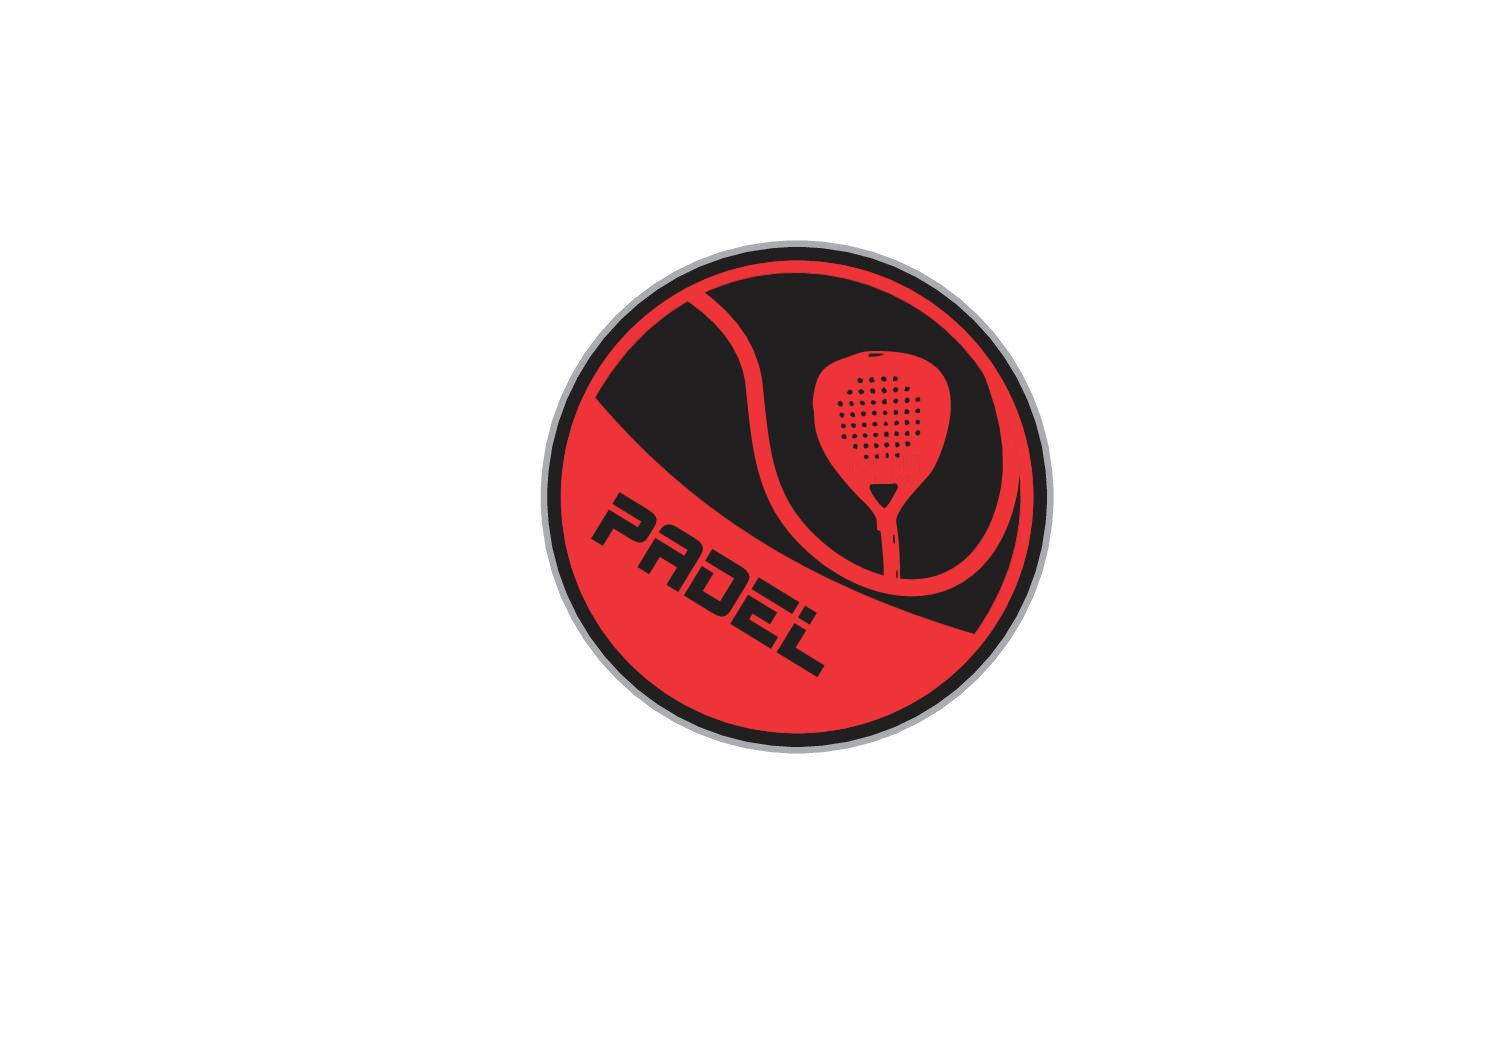 Kit personalizado para atleta de Padel, da cidade de Santa Maria/RS.